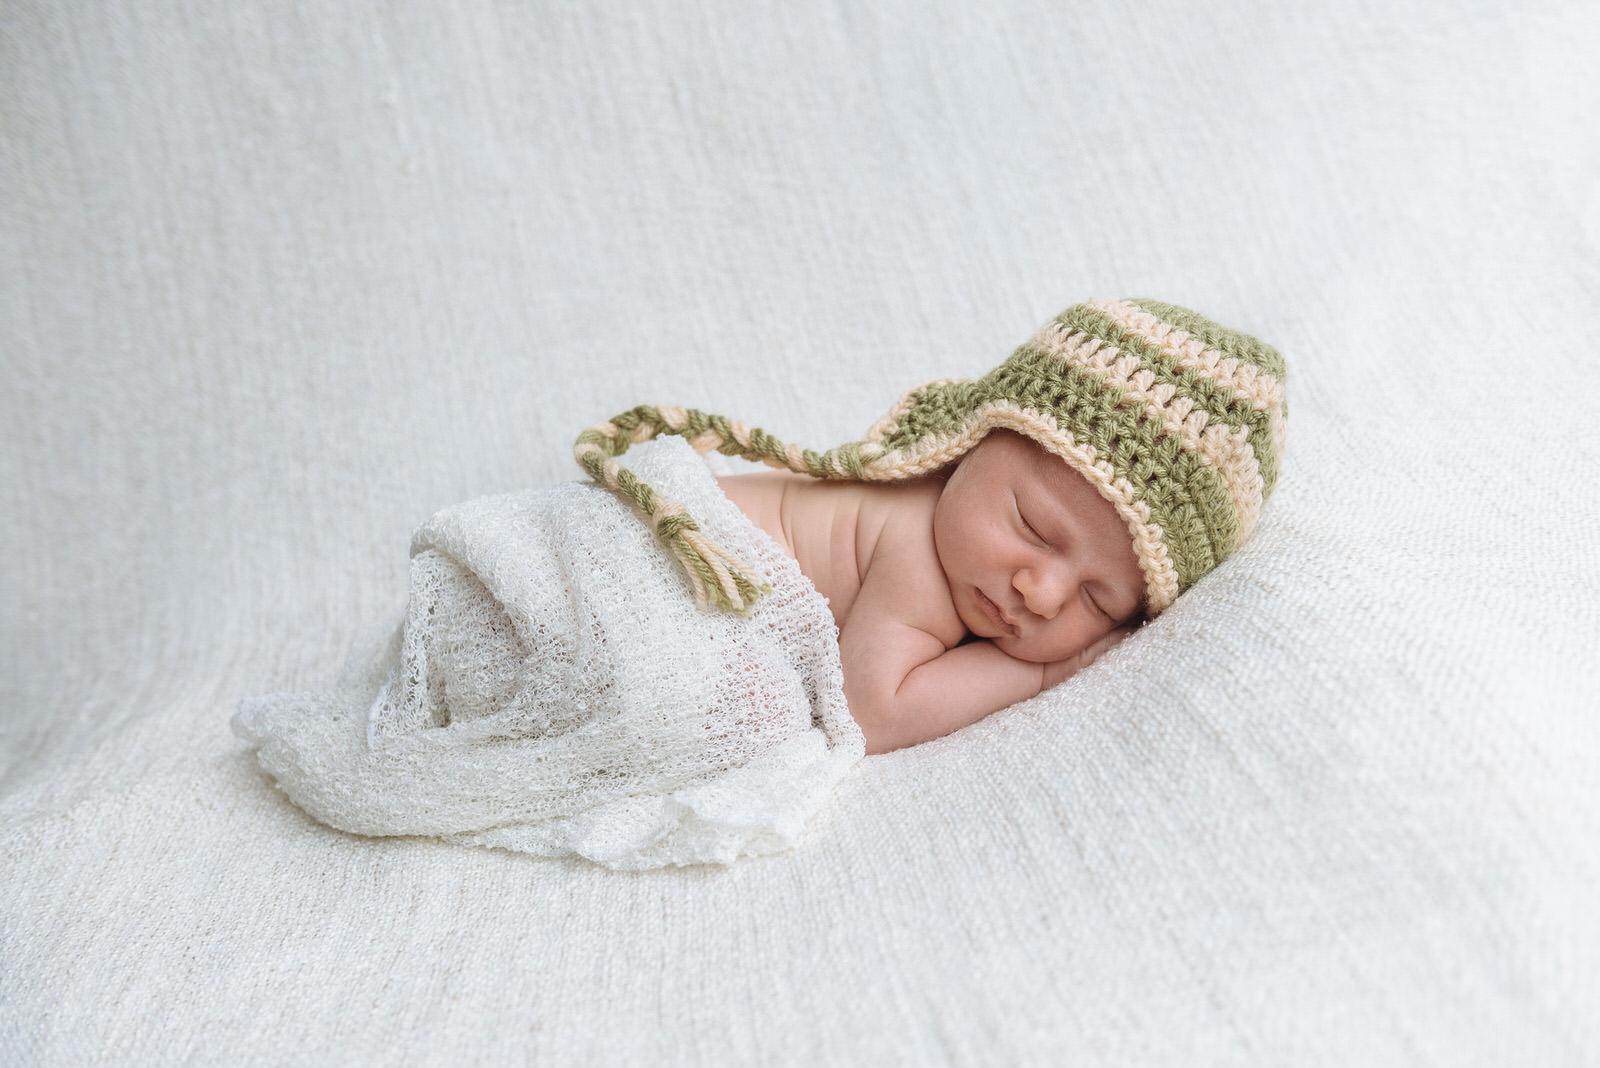 Newborn Photography Uckfield